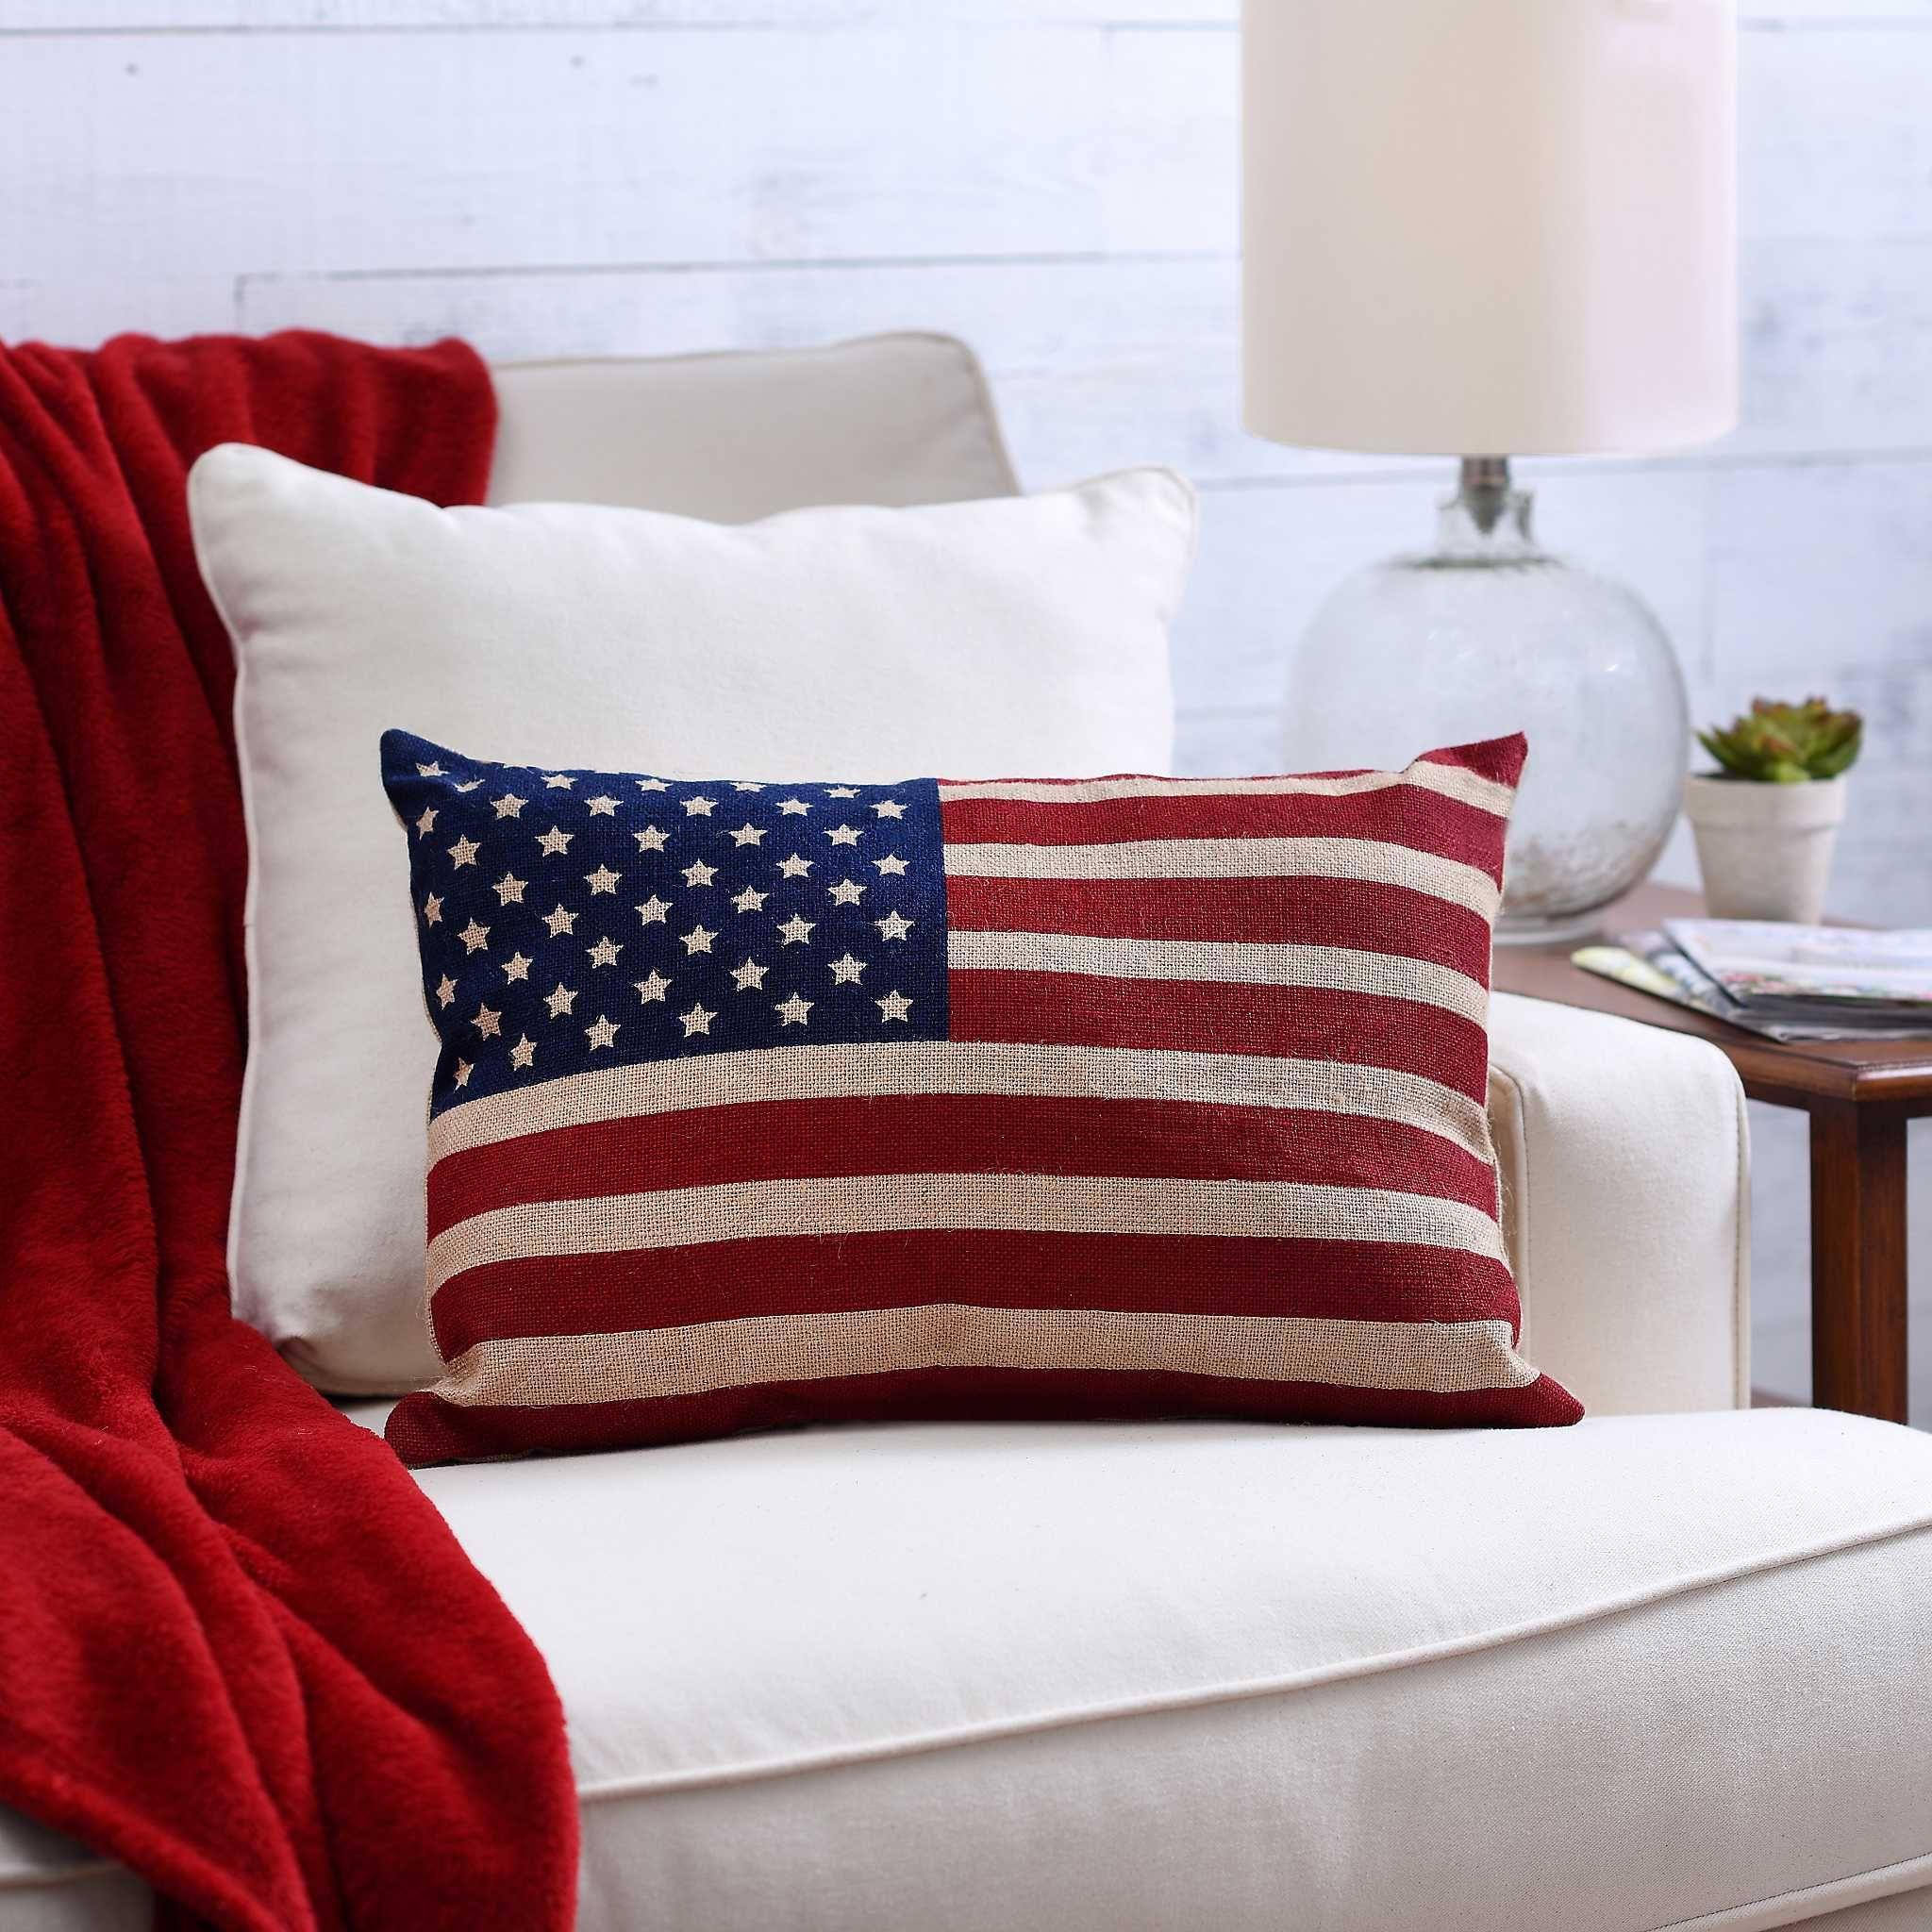 Burlap Flag Pillow In 2020 Pillows Burlap Flag Patriotic Decorations